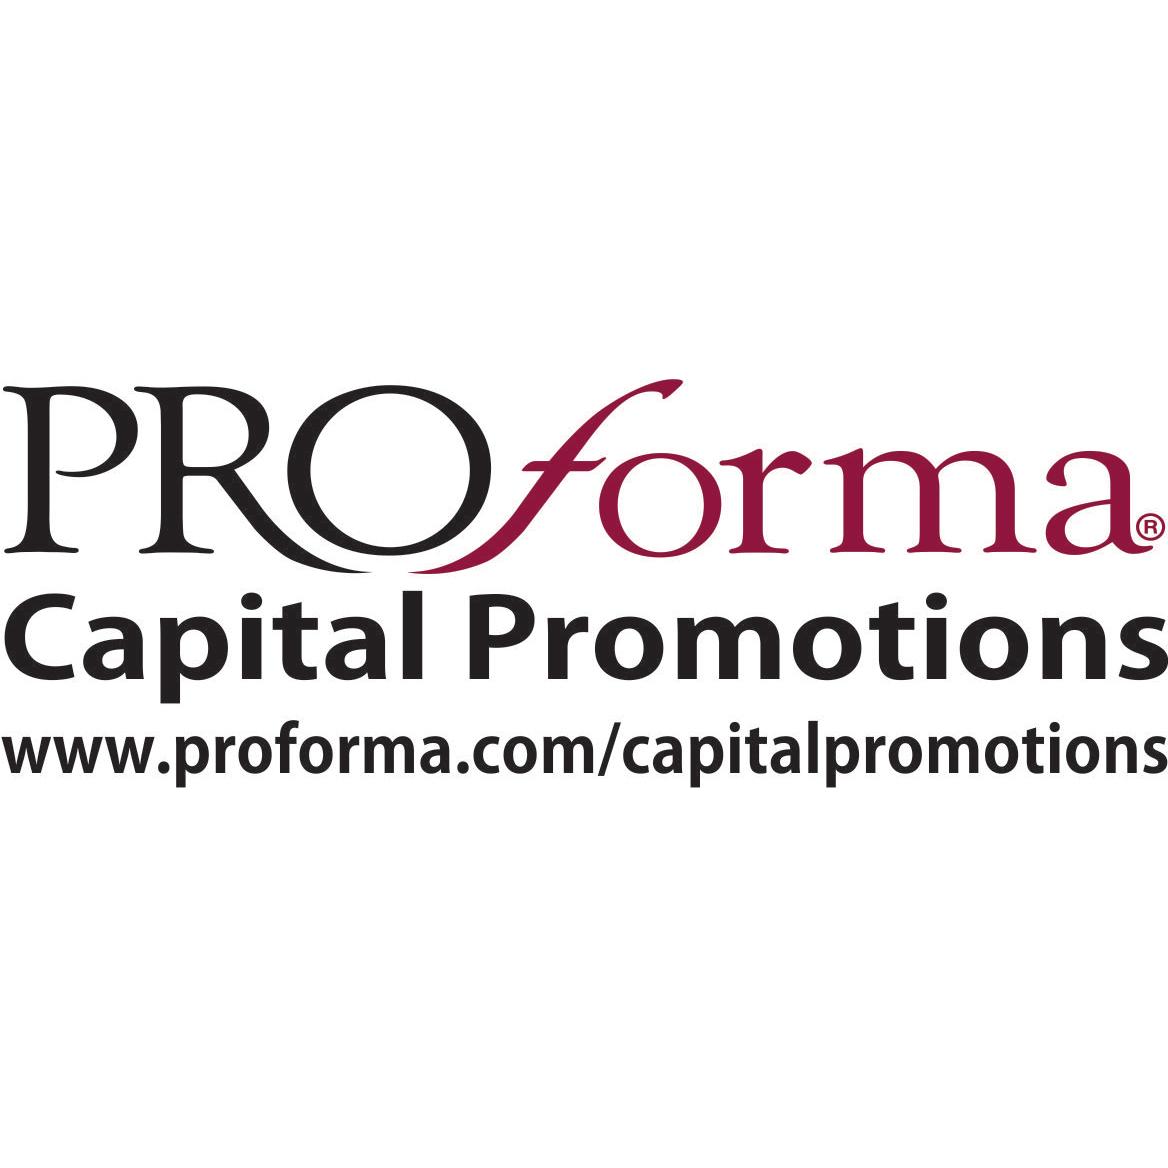 Proforma Capital Promotions